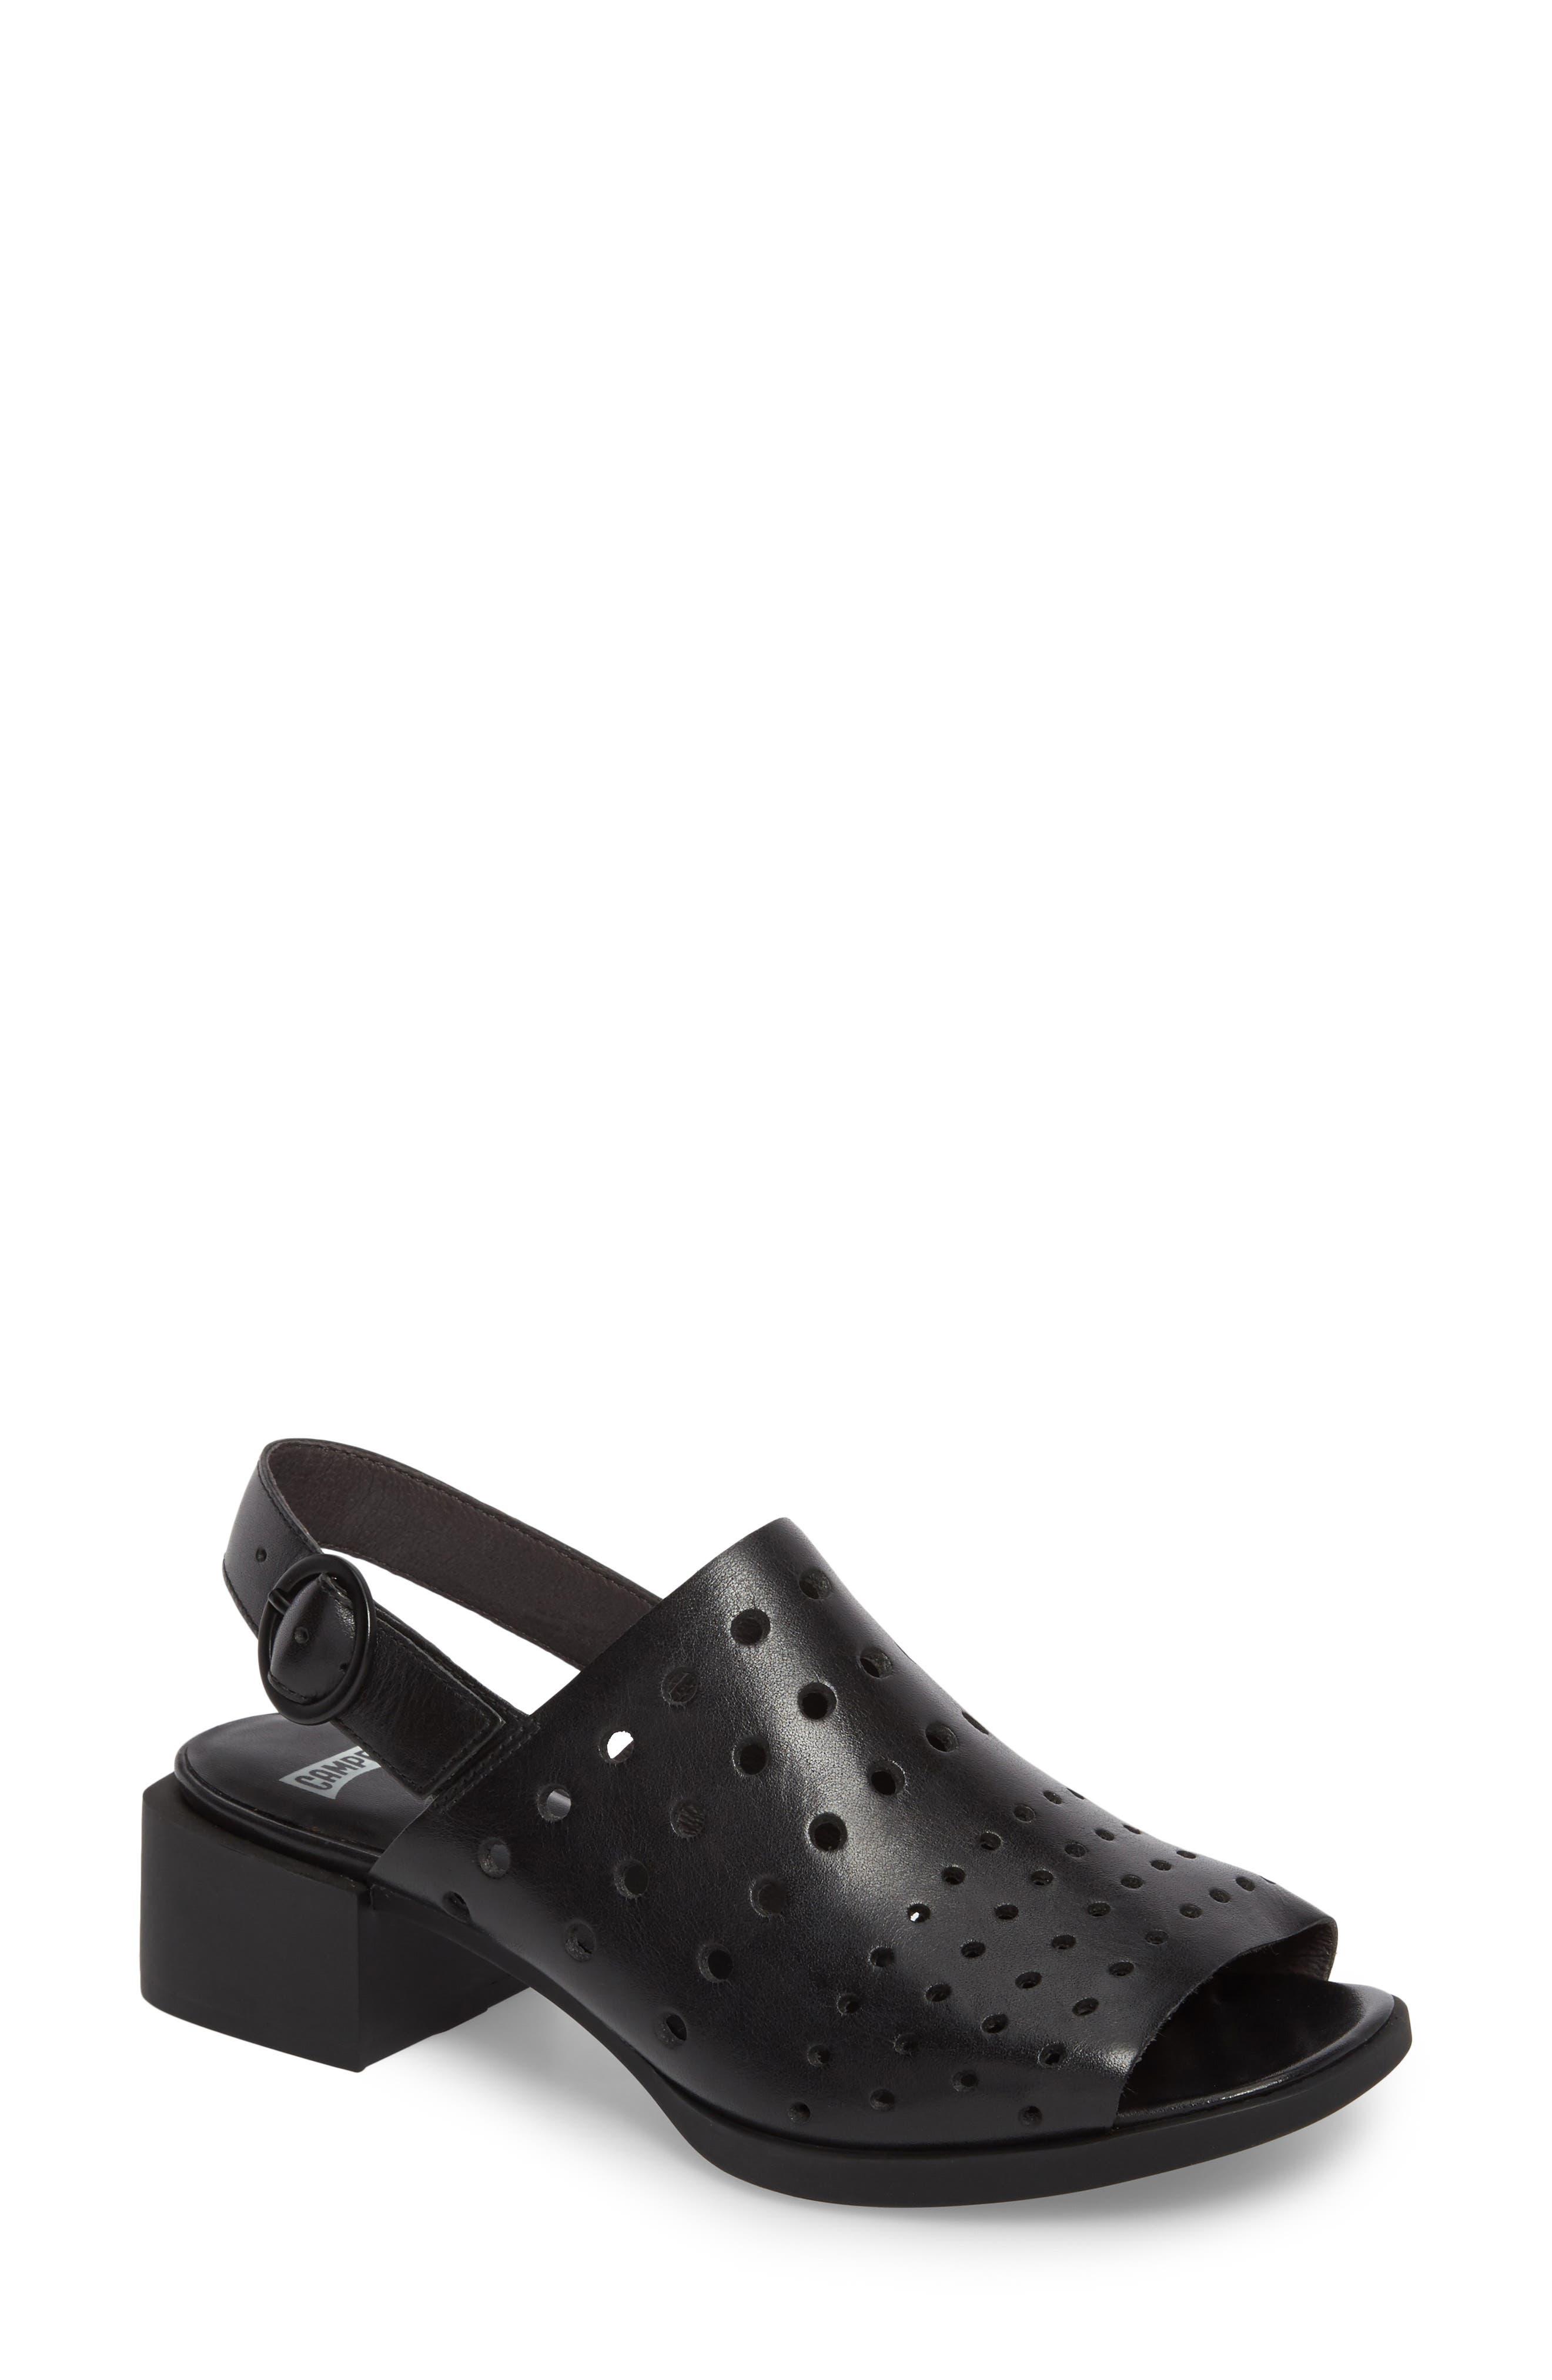 Twins Sandal,                             Main thumbnail 1, color,                             Black Leather